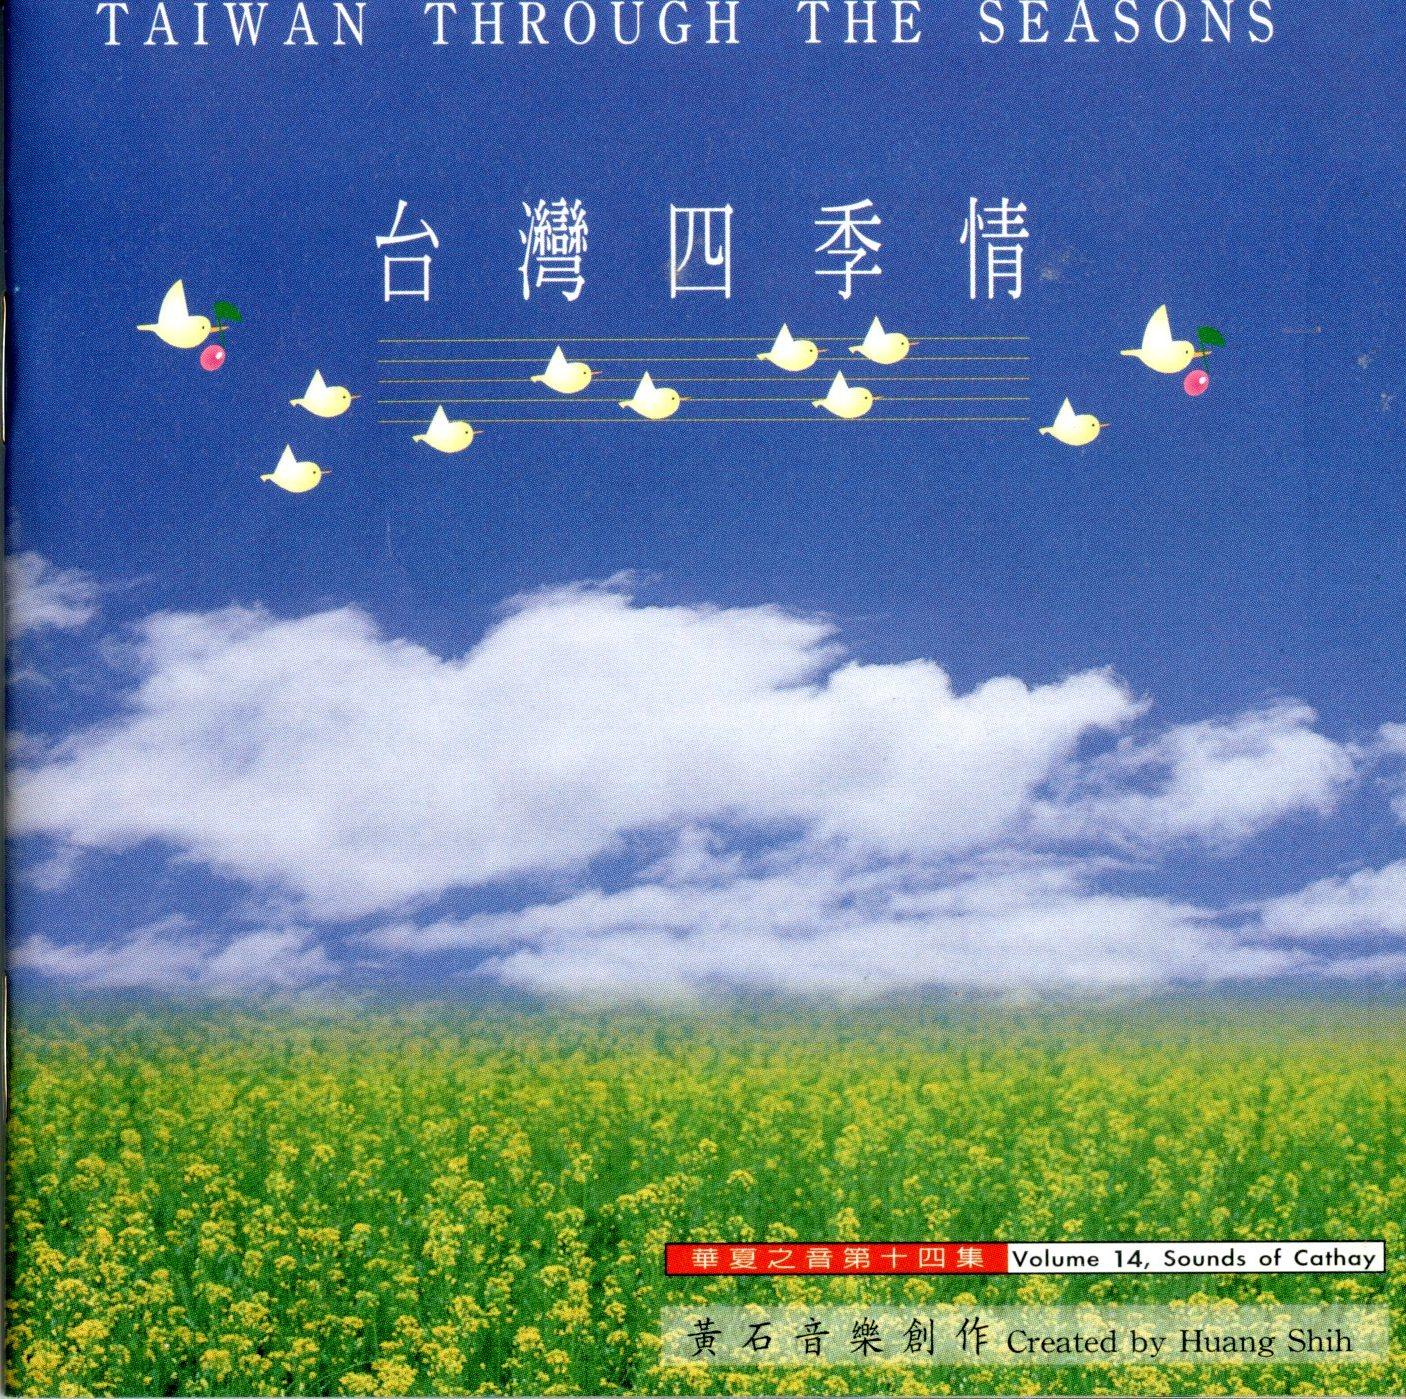 臺灣四季情 Taiwan through the seasons /